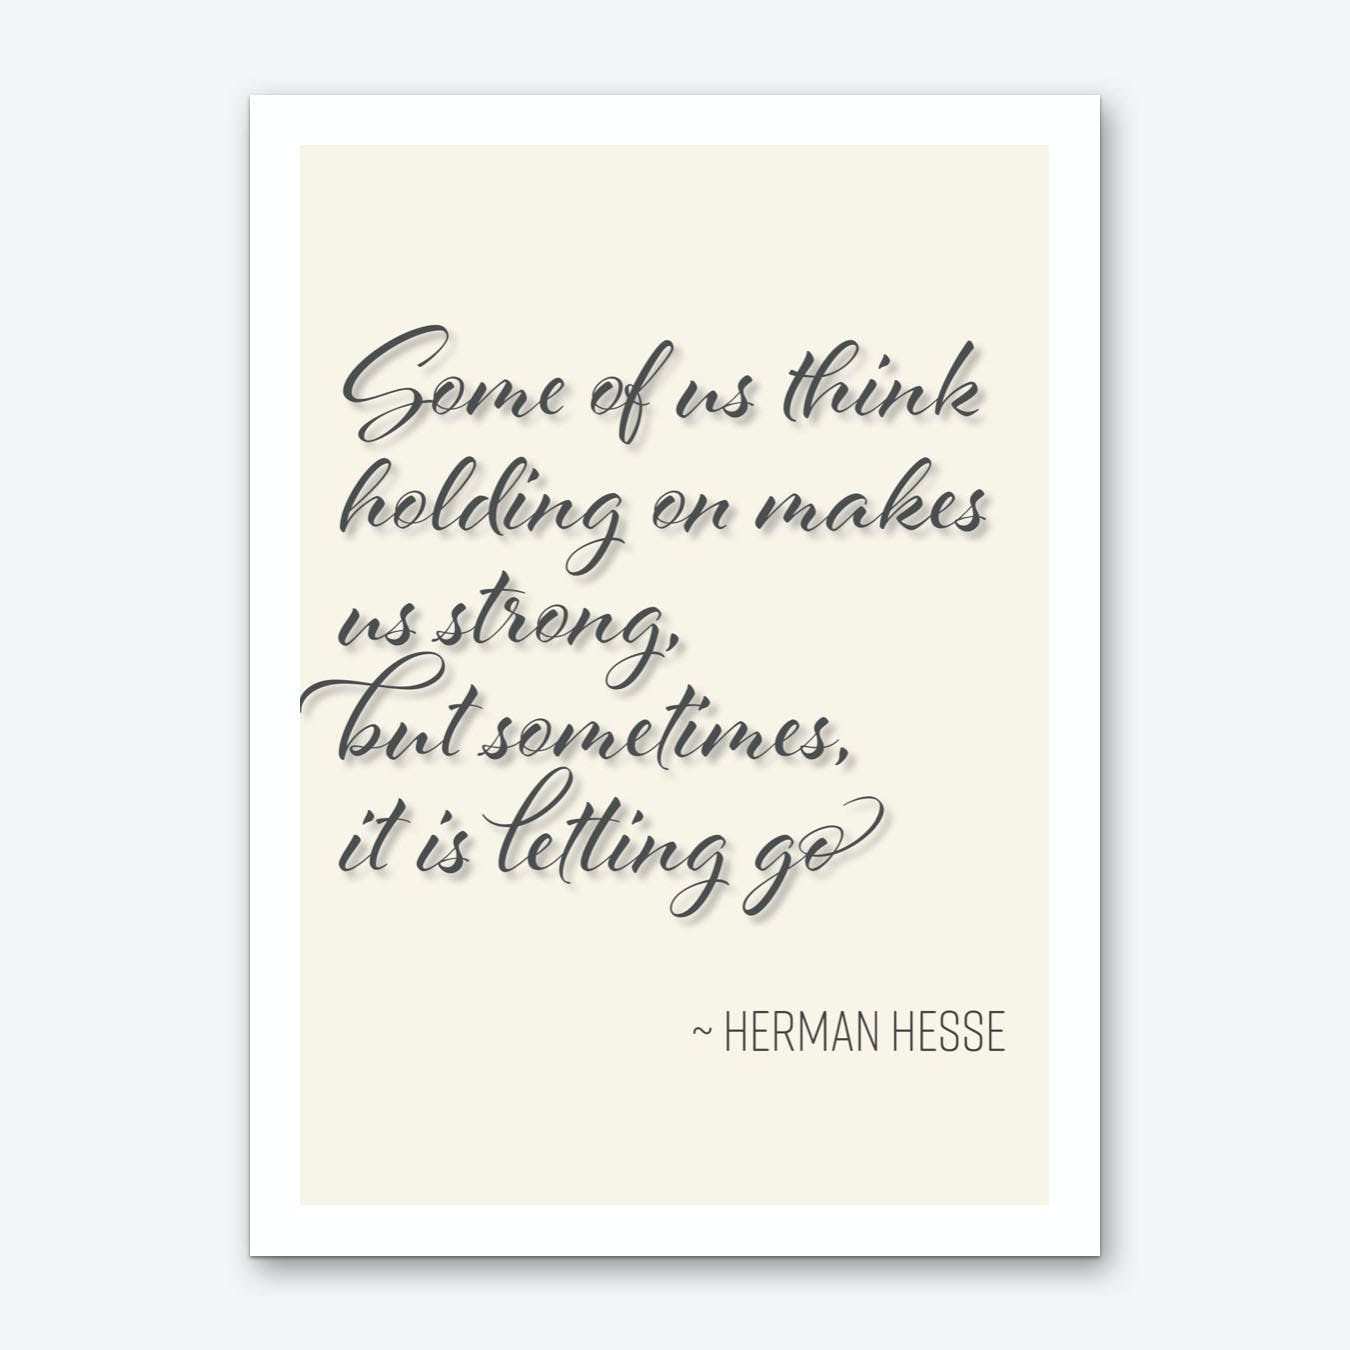 Herman Hesse quote on letting go Art Print